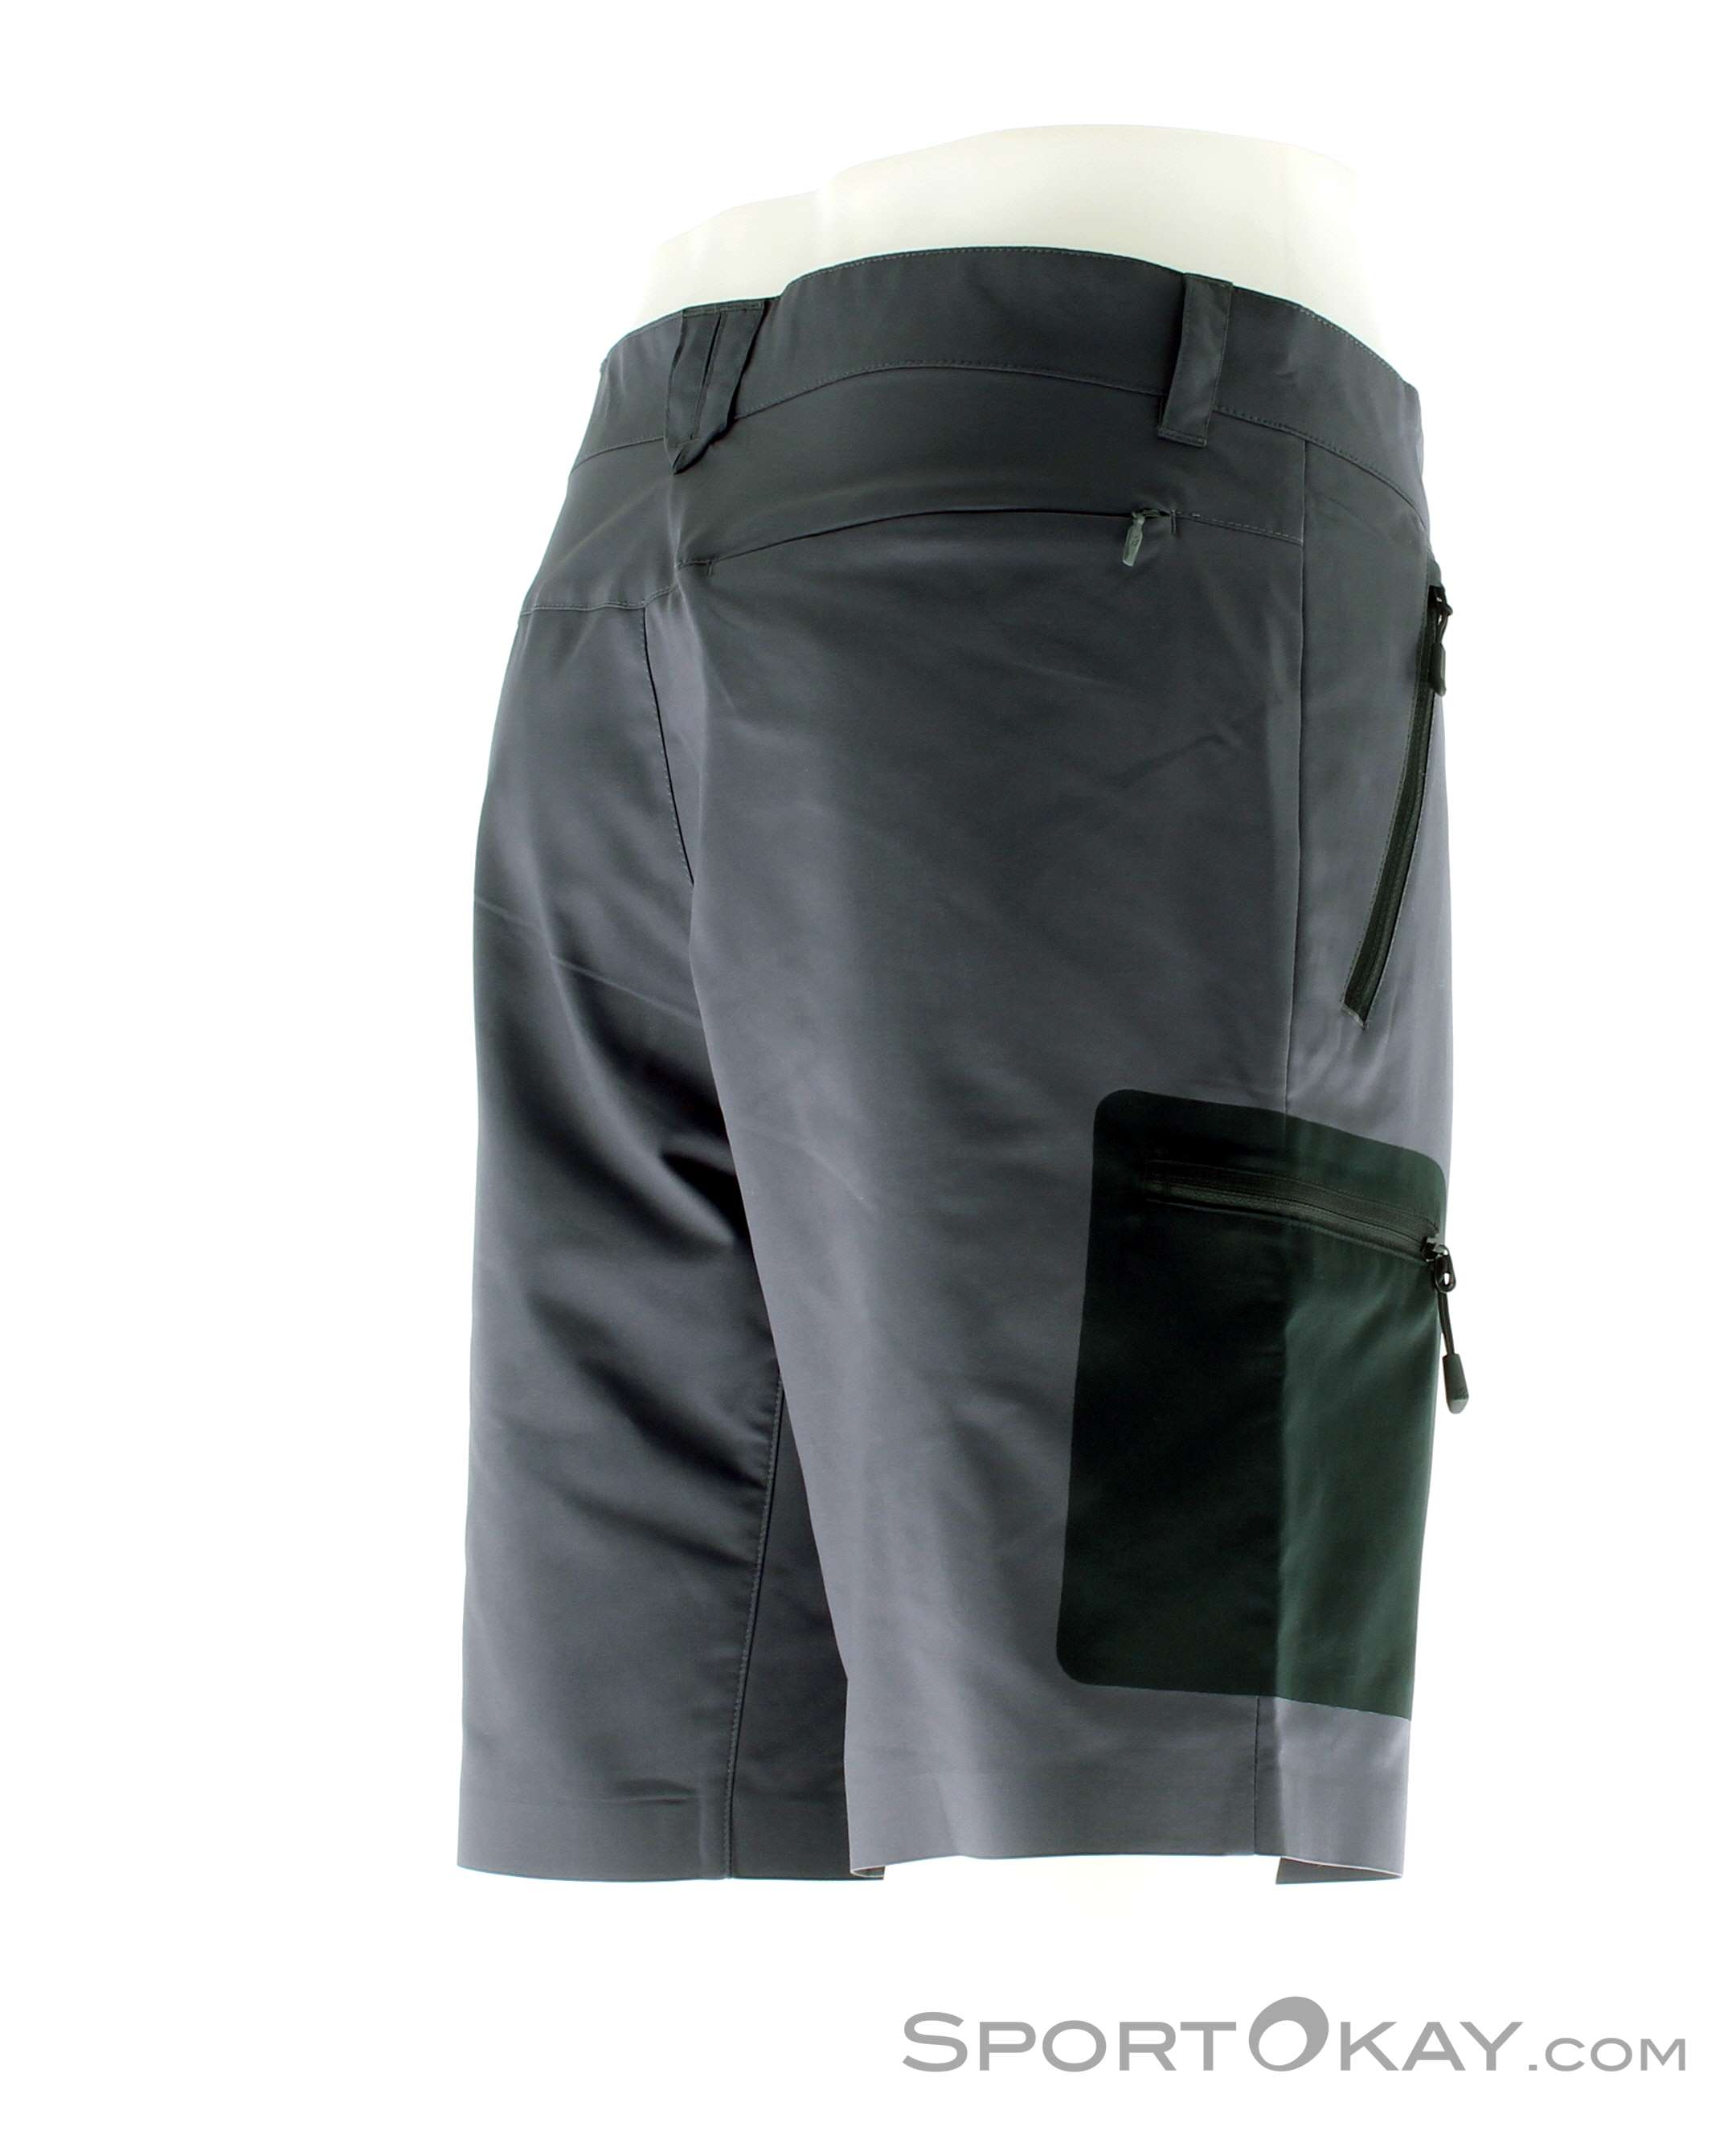 3781c83022f Jack Wolfskin Active Track Shorts Mens Outdoor Shorts - Pants ...